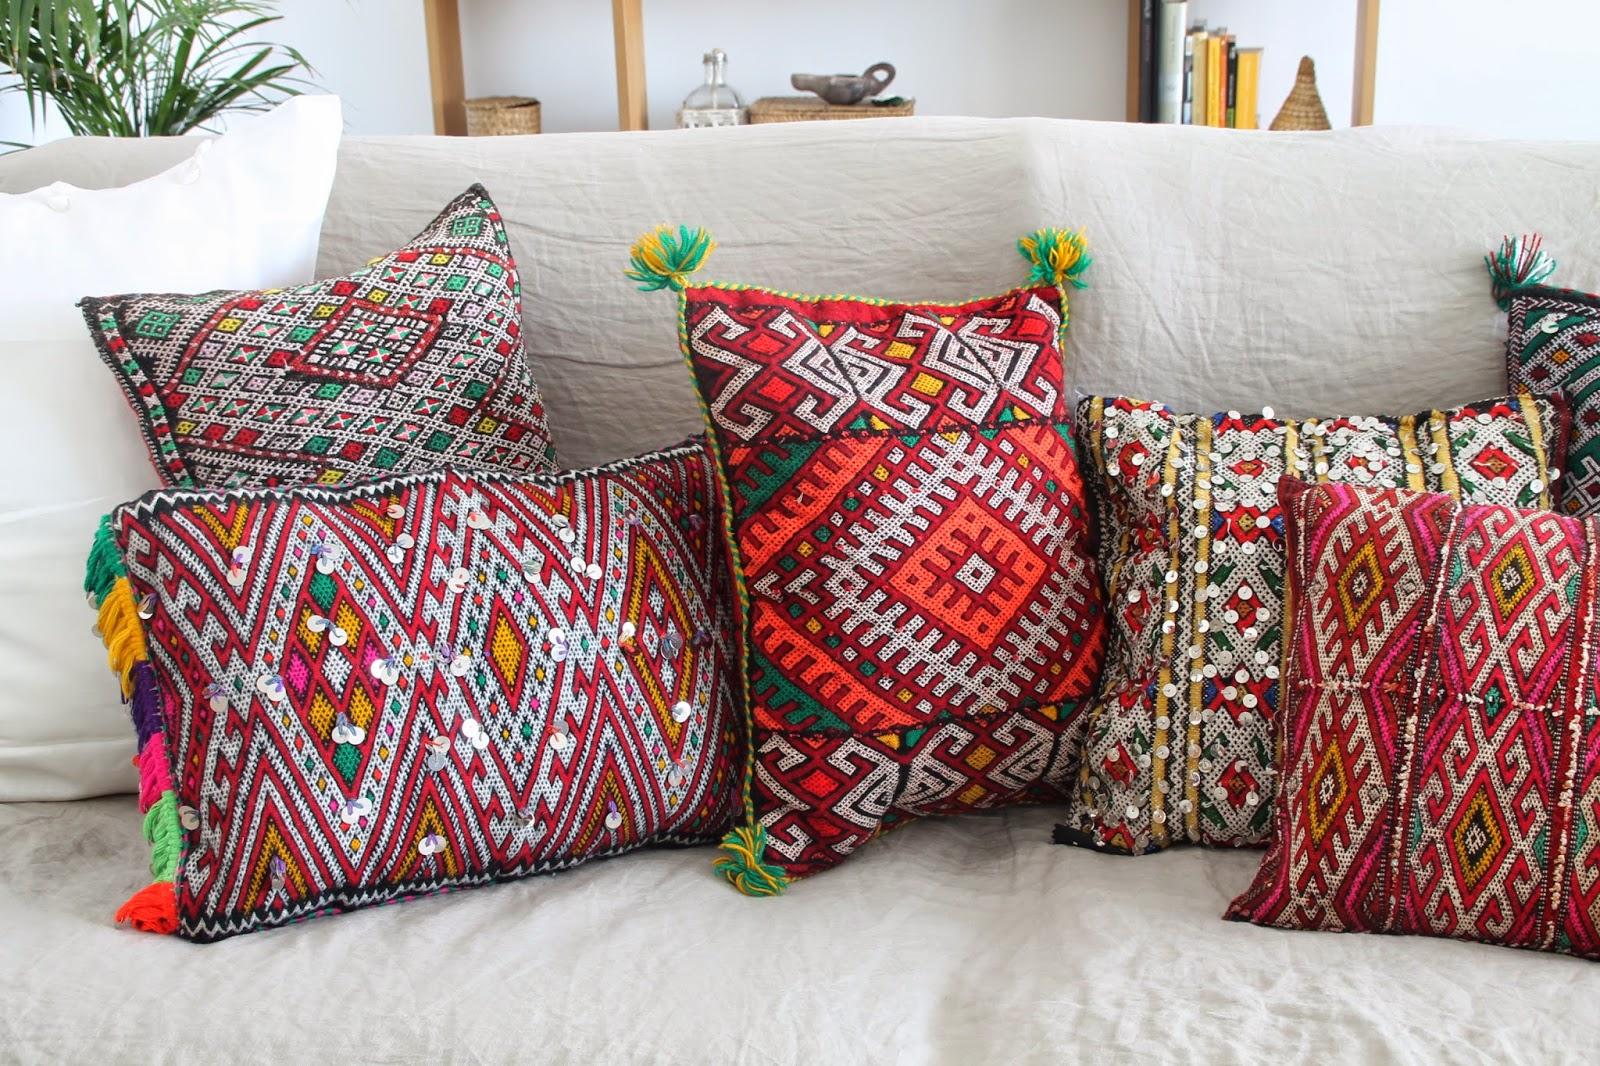 quedamosen_bazar_textil